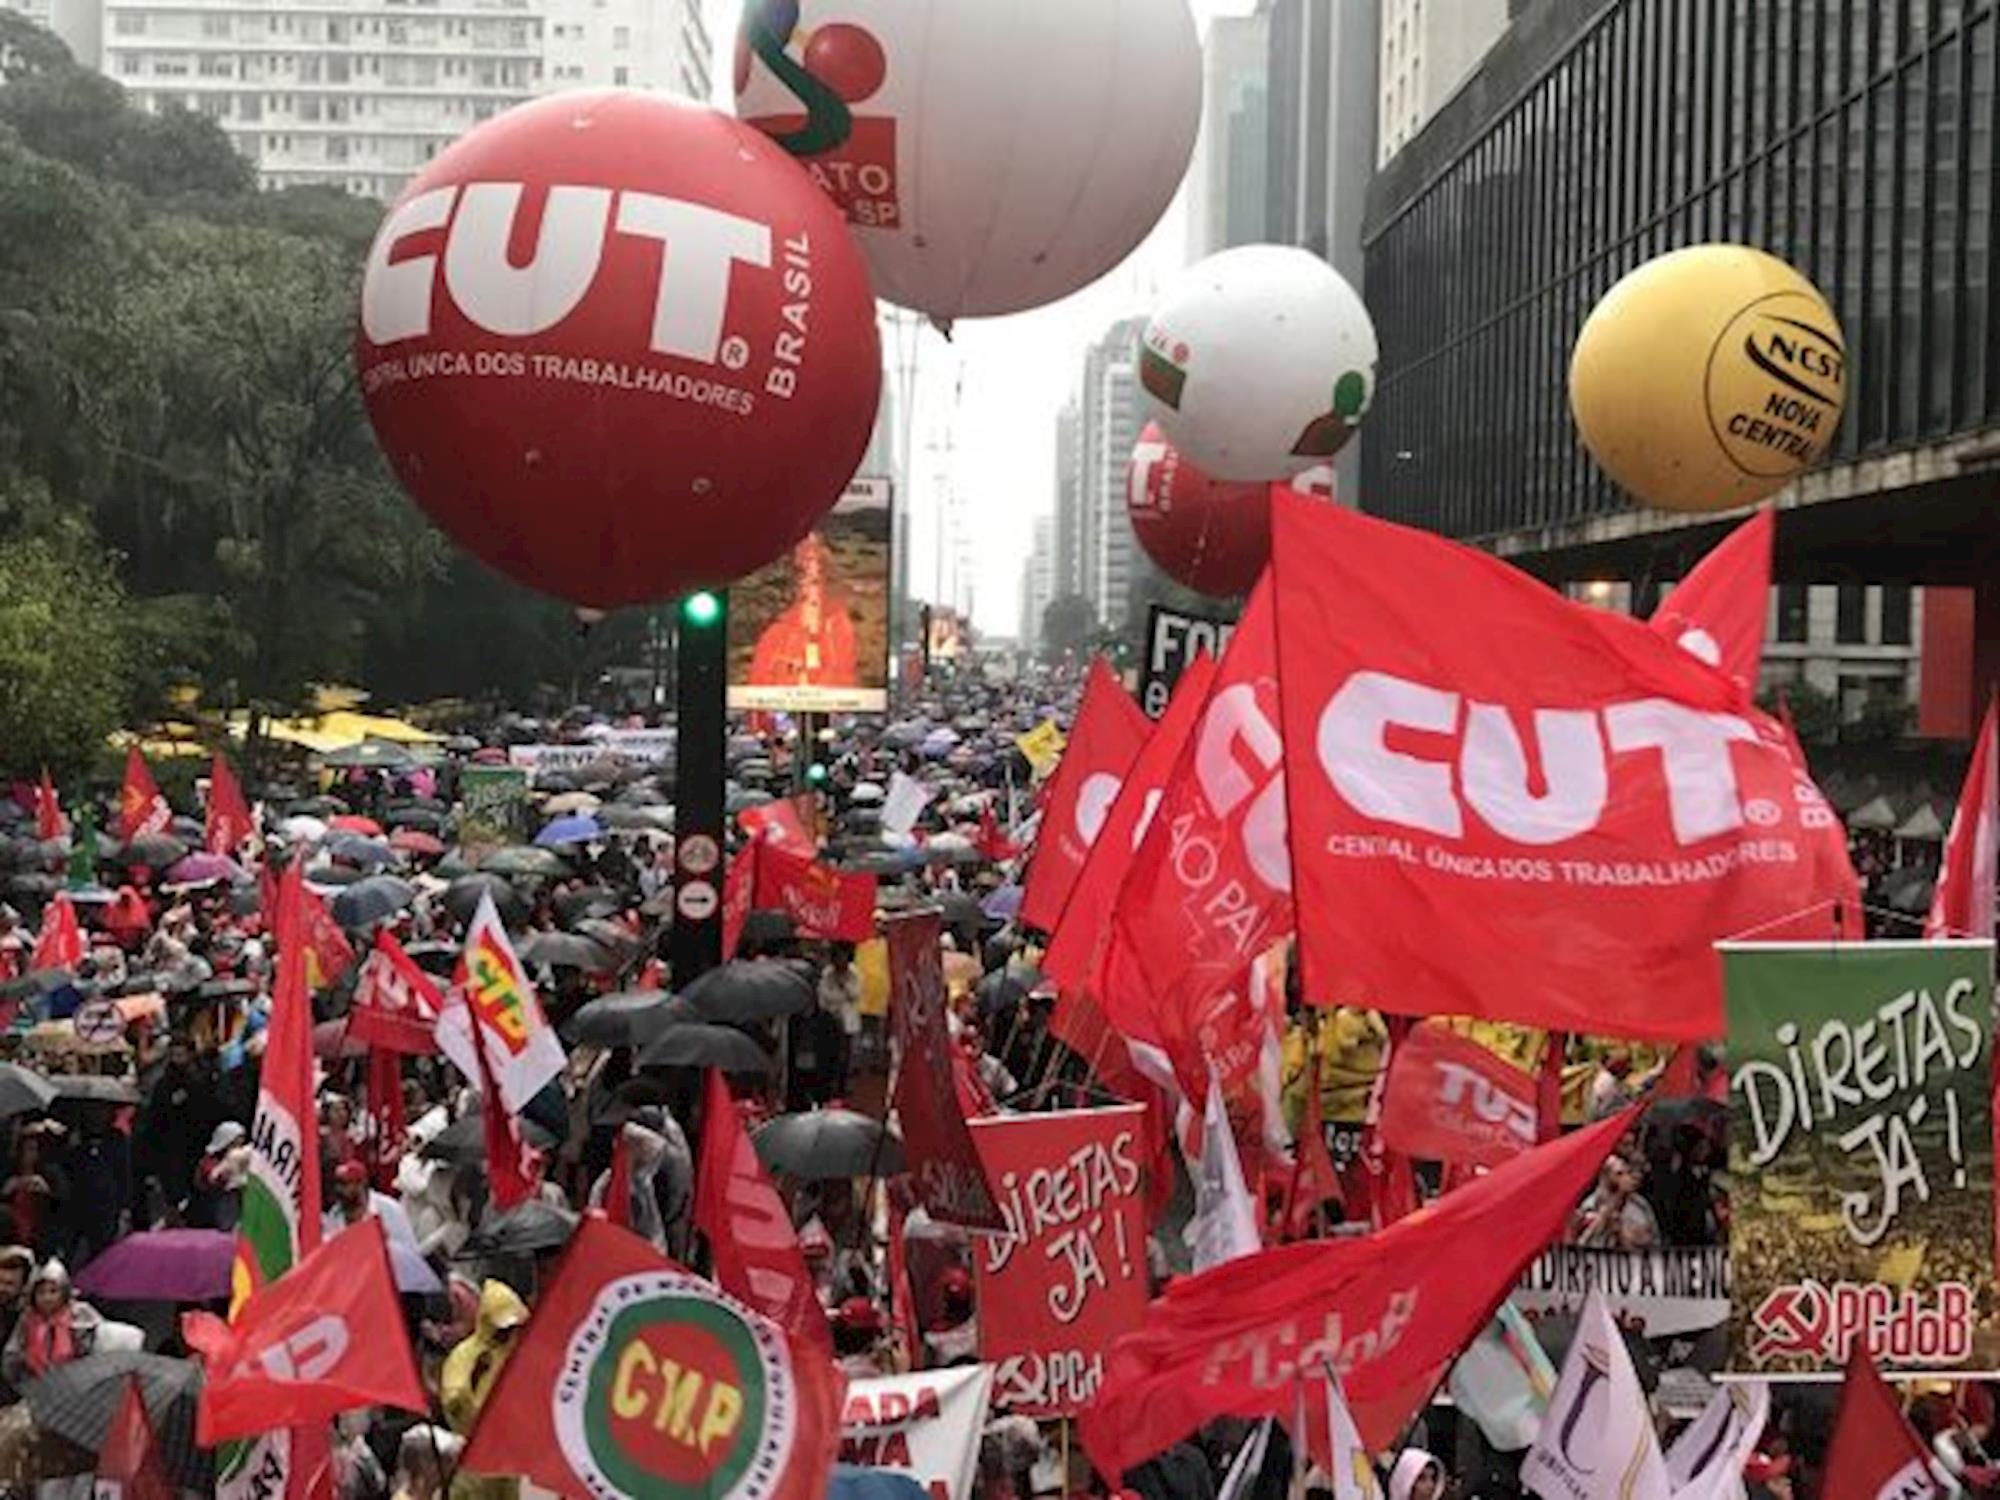 CUT, manifestações, paulista, fora temer, fora, temer, golpista, golpismo, diretas já, CUT/SP